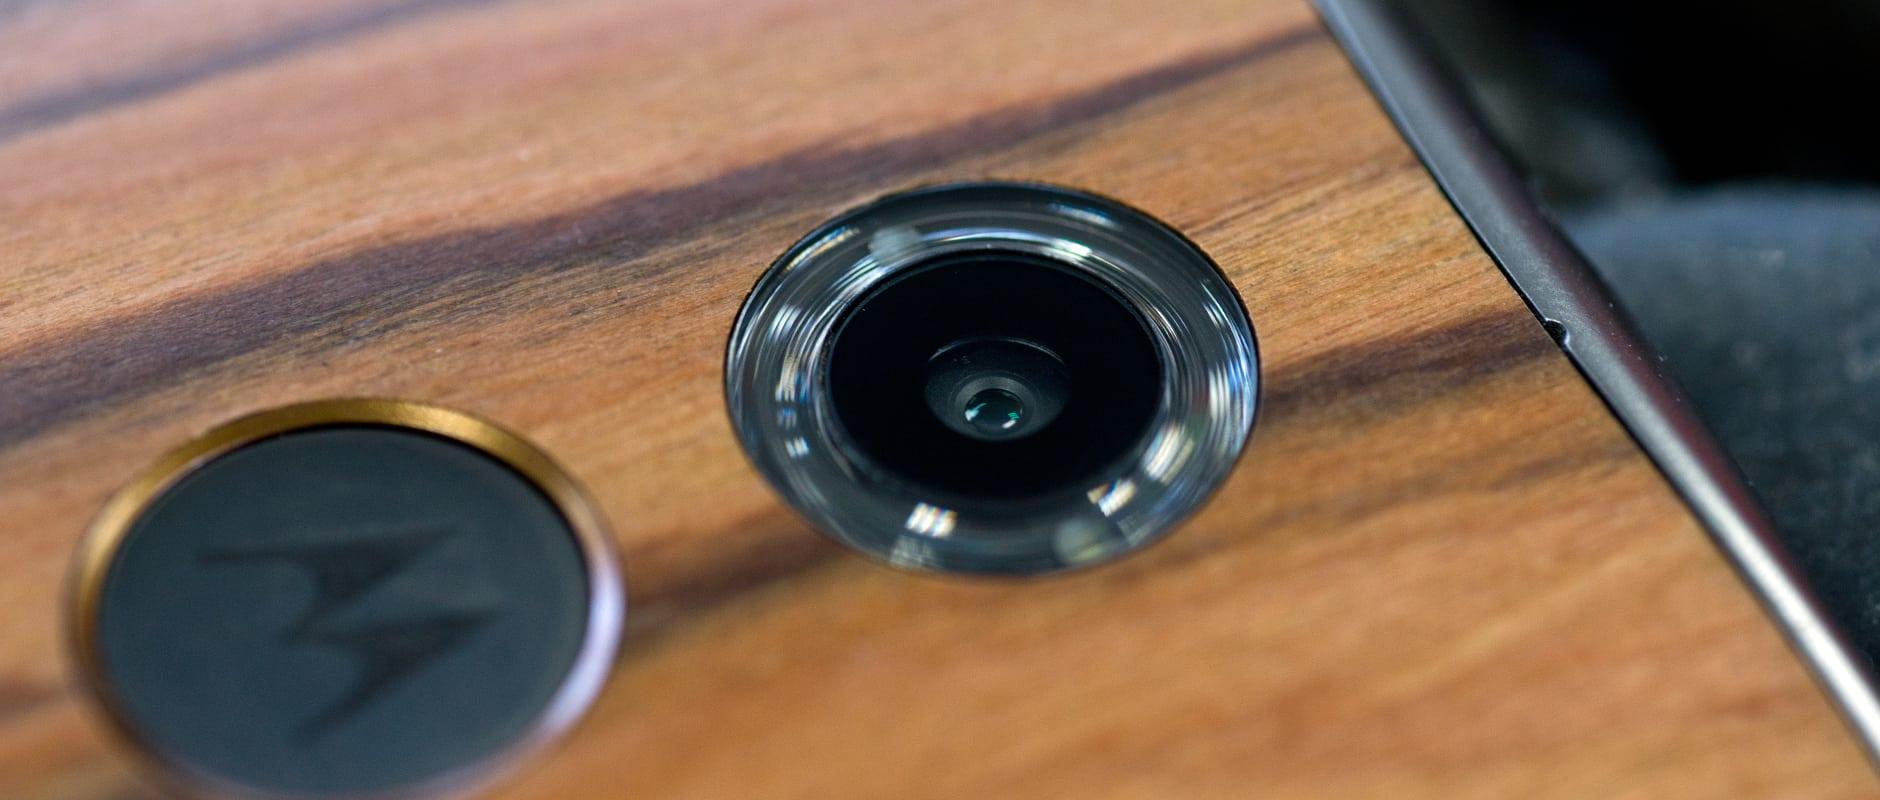 The rear camera of the Motorola Moto X (2014 edition)